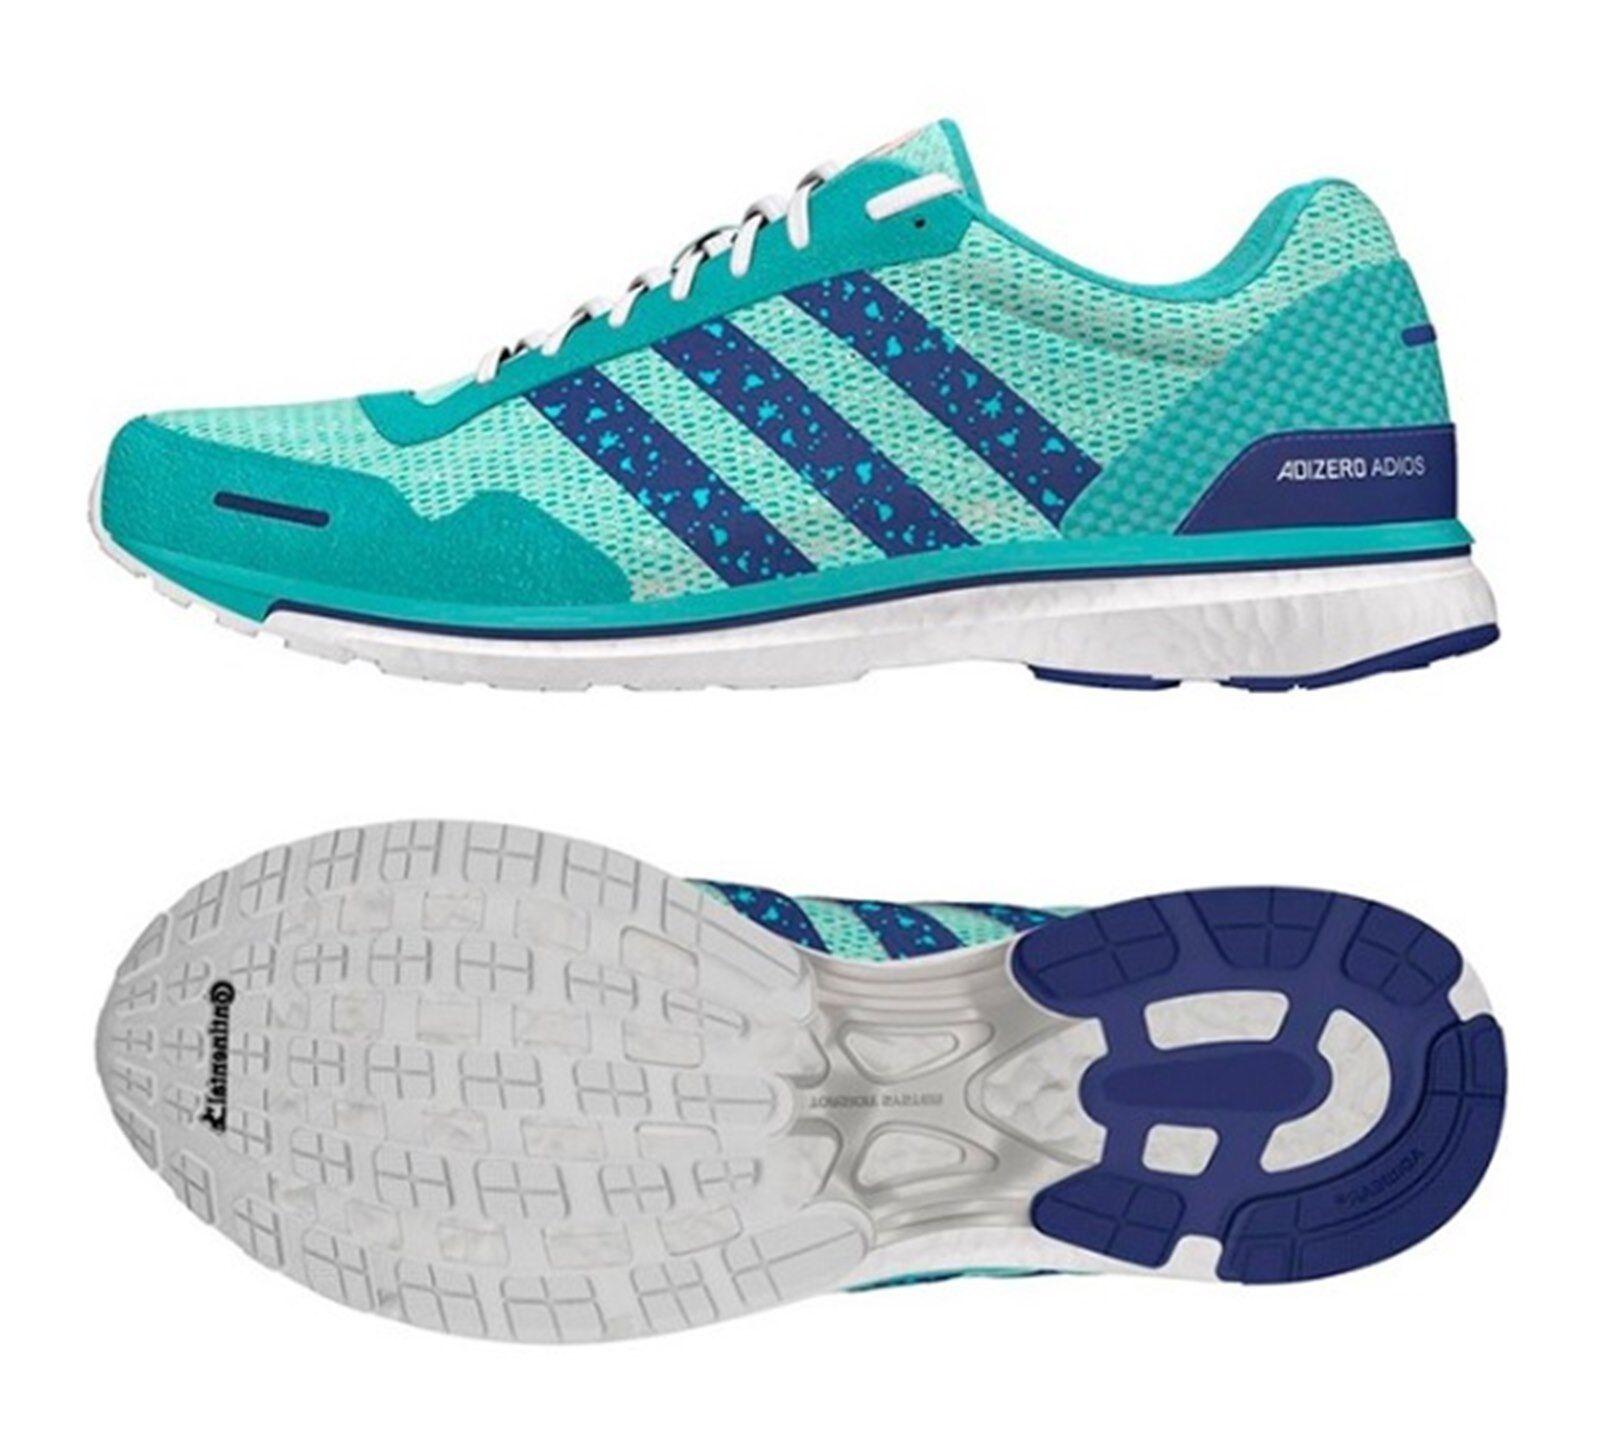 Adidas damen ADIZERO ADIOS Training schuhe Running Mint Turnschuhe schuhe CM8361